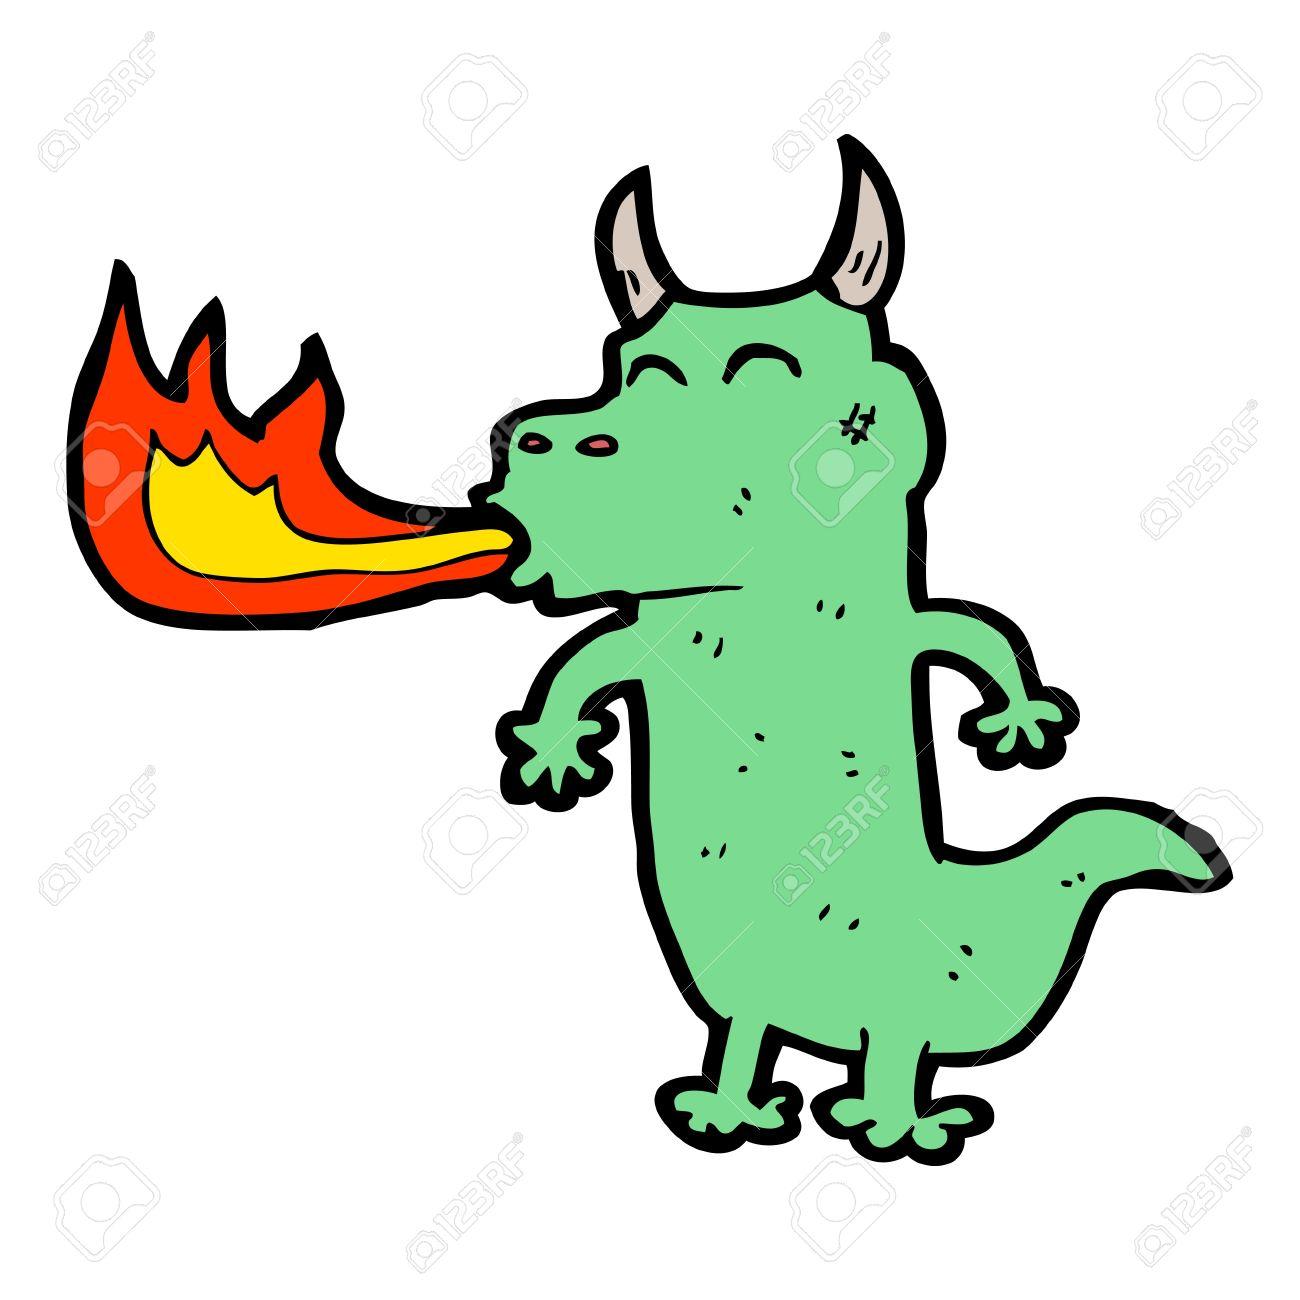 16124832-cartoon-dragon-spitting-fire-St